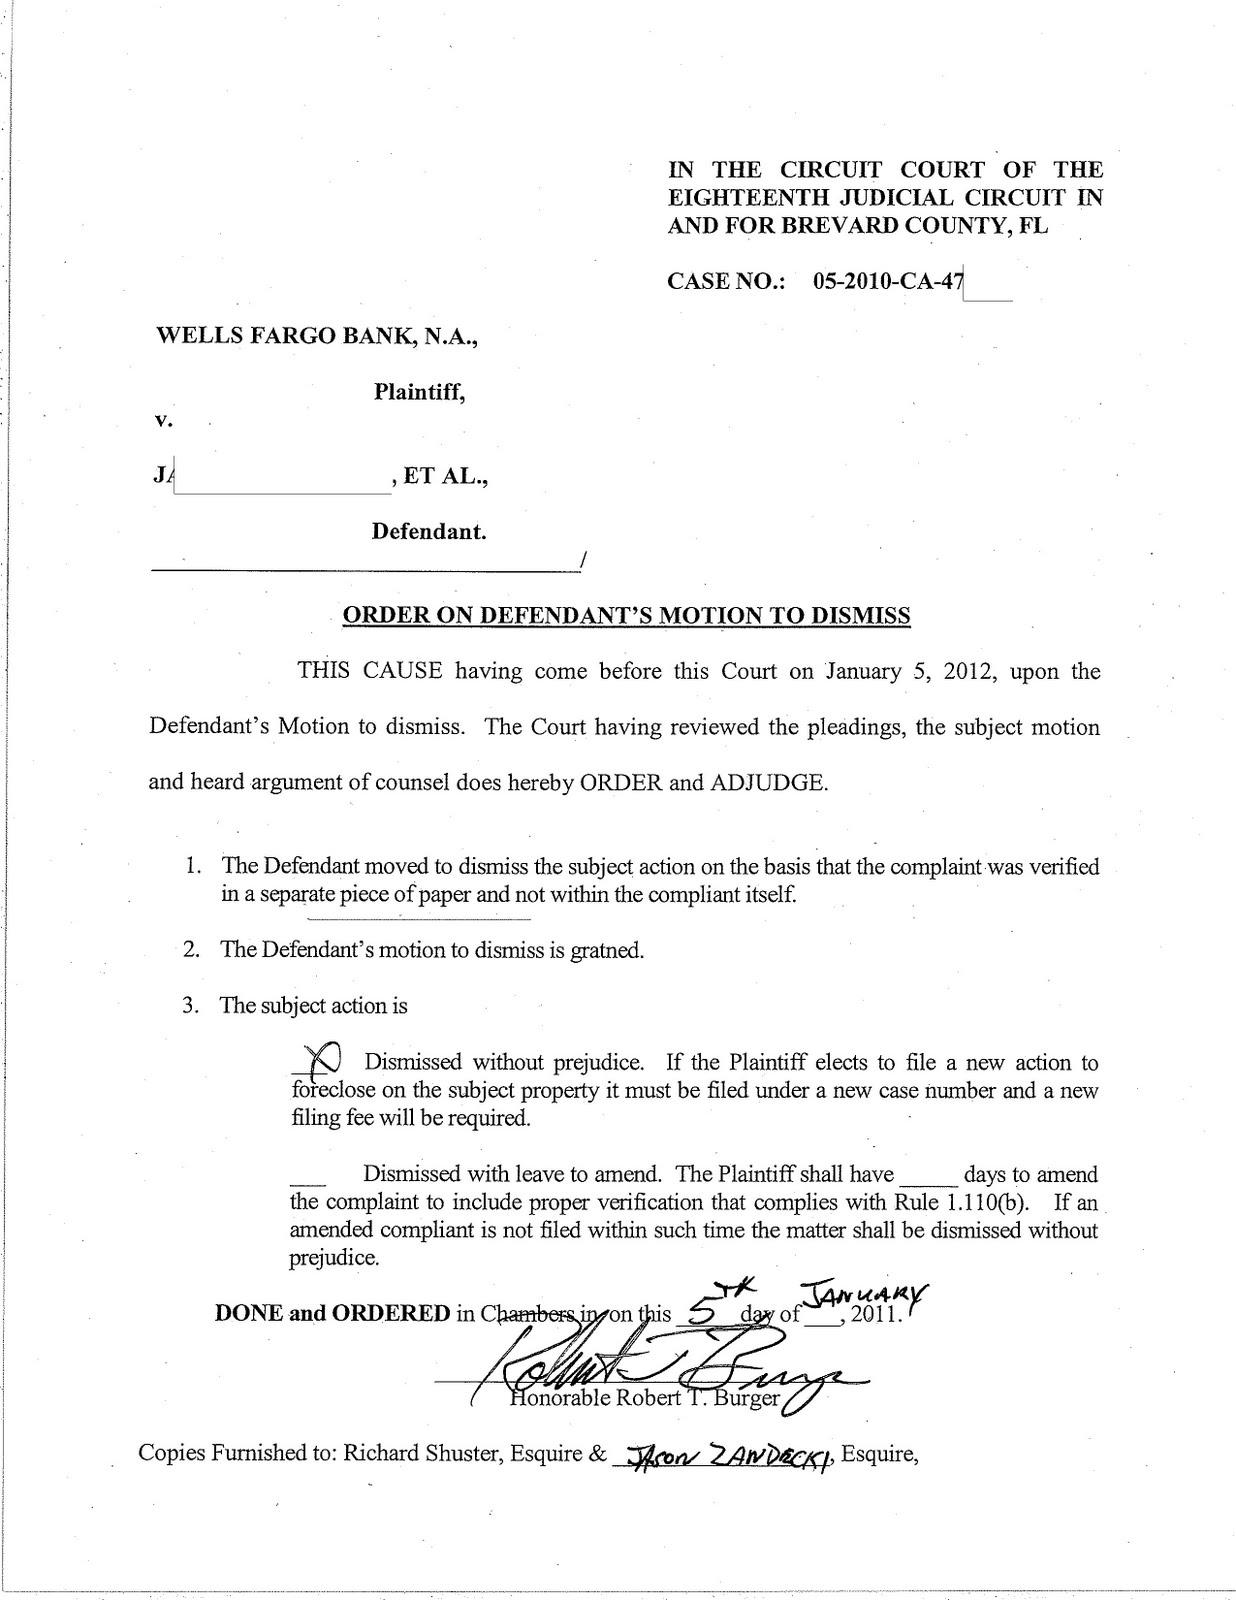 Florida Foreclosure Defense Blog Shuster Amp Saben Defeats Wells Fargo Amp Florida Default Law Group